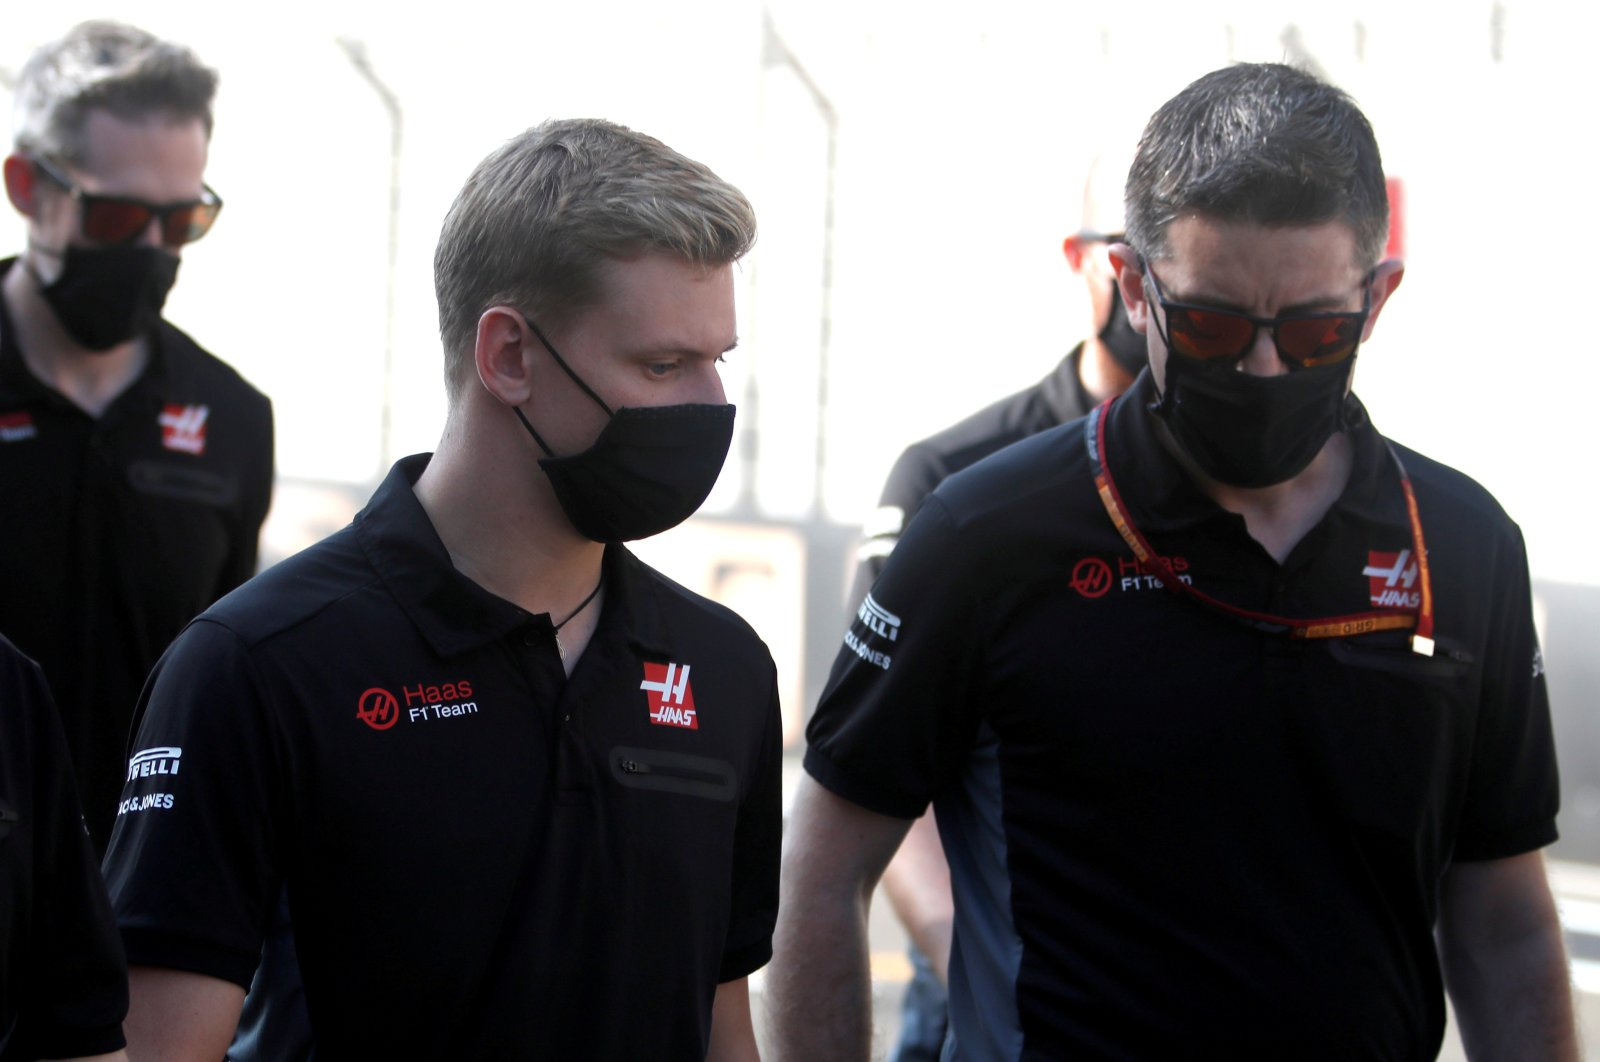 Haas' Mick Schumacher (L) walks the circuit with his team at Yas Marina Circuit, Abu Dhabi, United Arab Emirates,Dec. 10, 2020. (Reuters Photo)